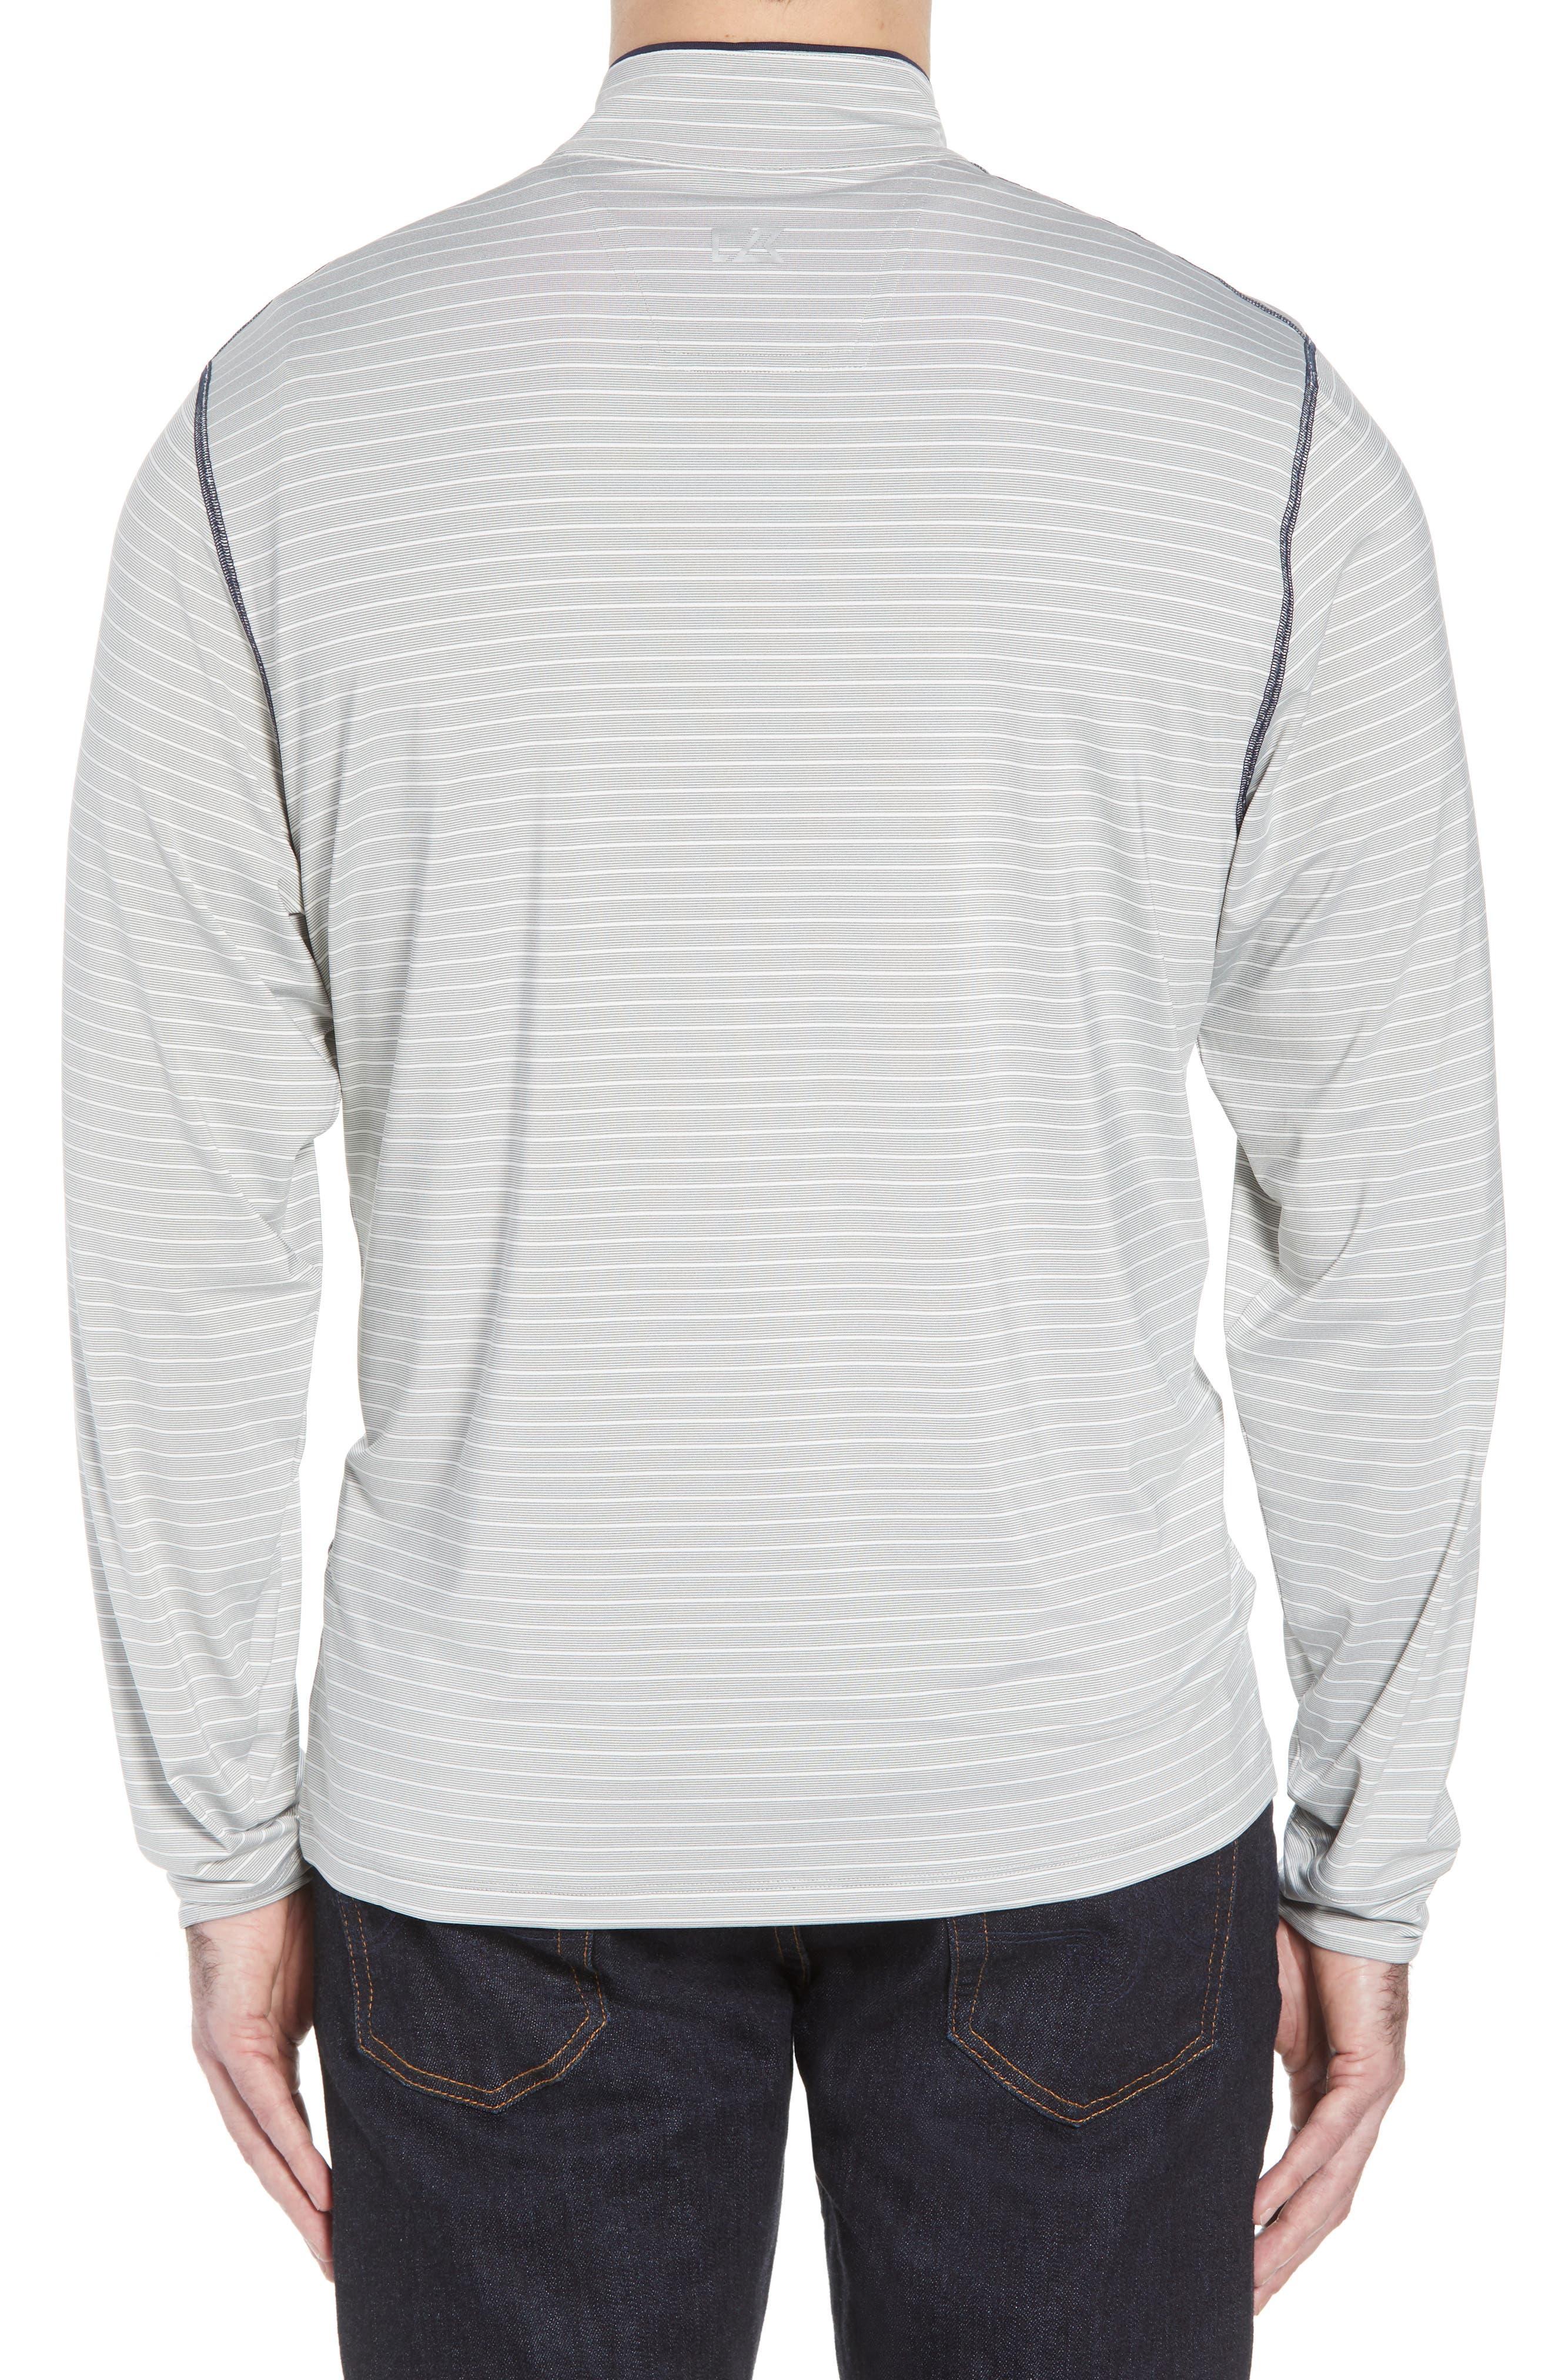 Meridian - Tennessee Titans Regular Fit Half Zip Pullover,                             Alternate thumbnail 2, color,                             NAVY